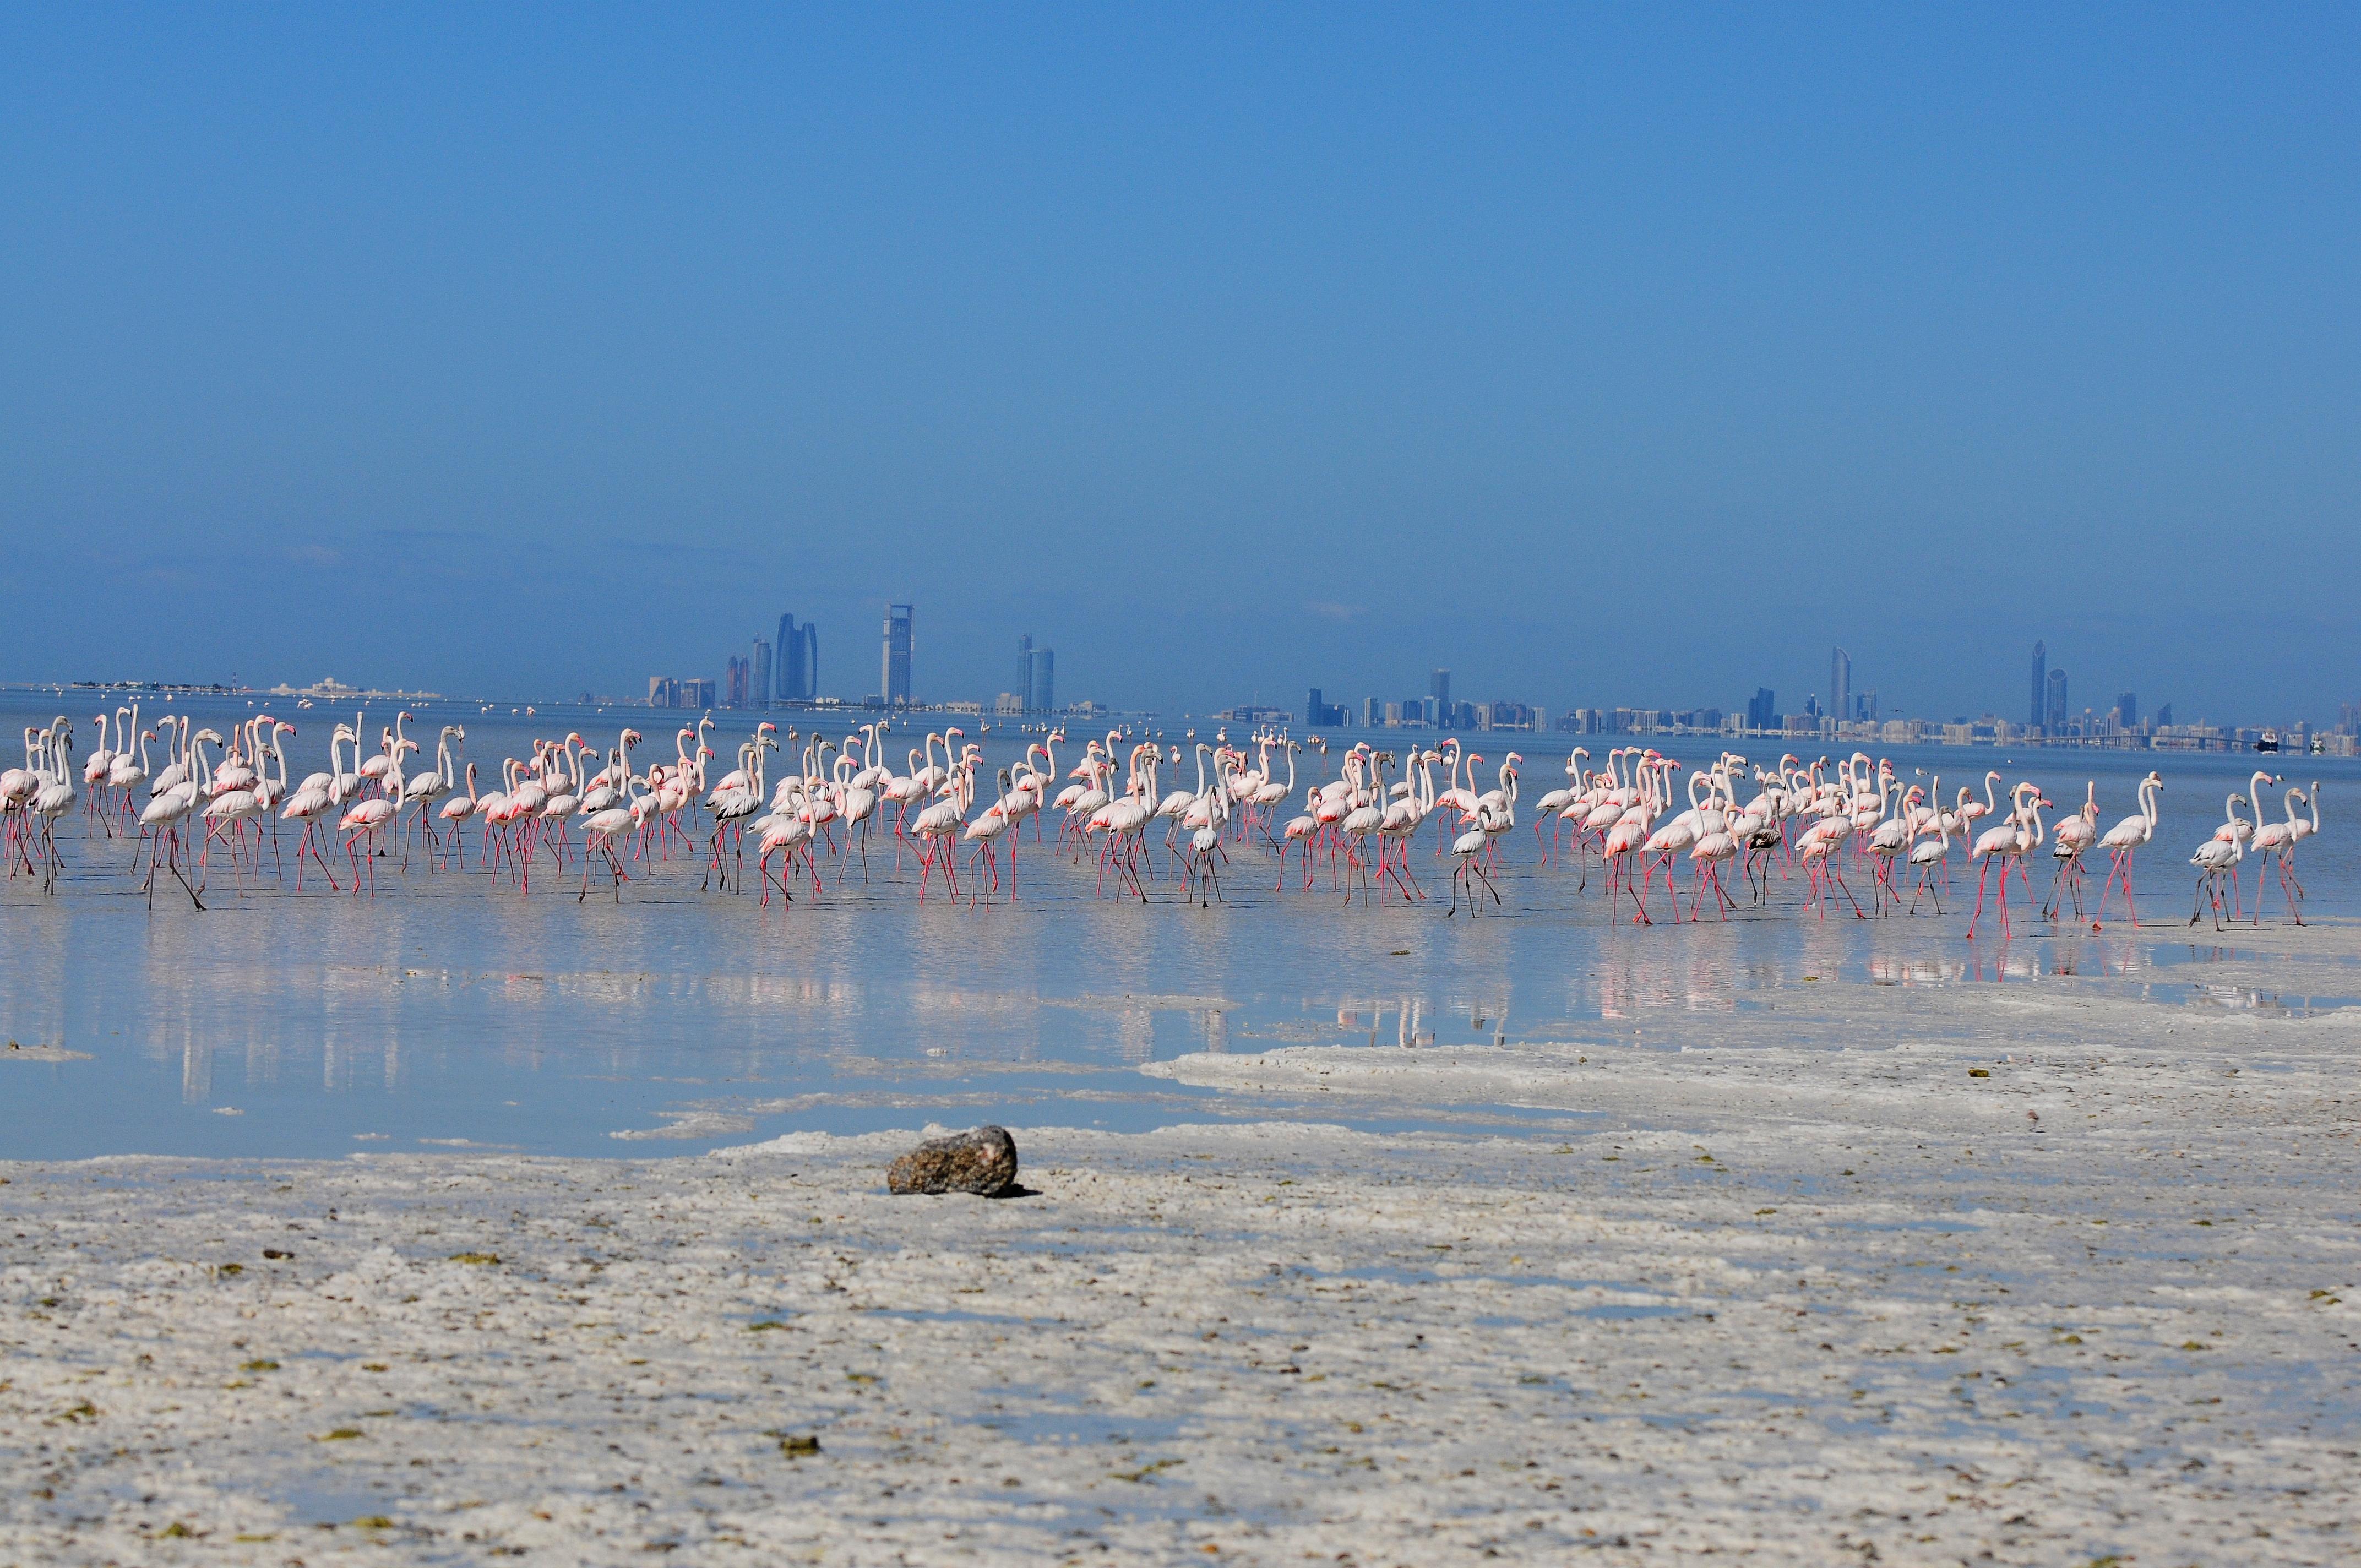 Greater Flamingos in Bul Syayeef one of Ramsar sites